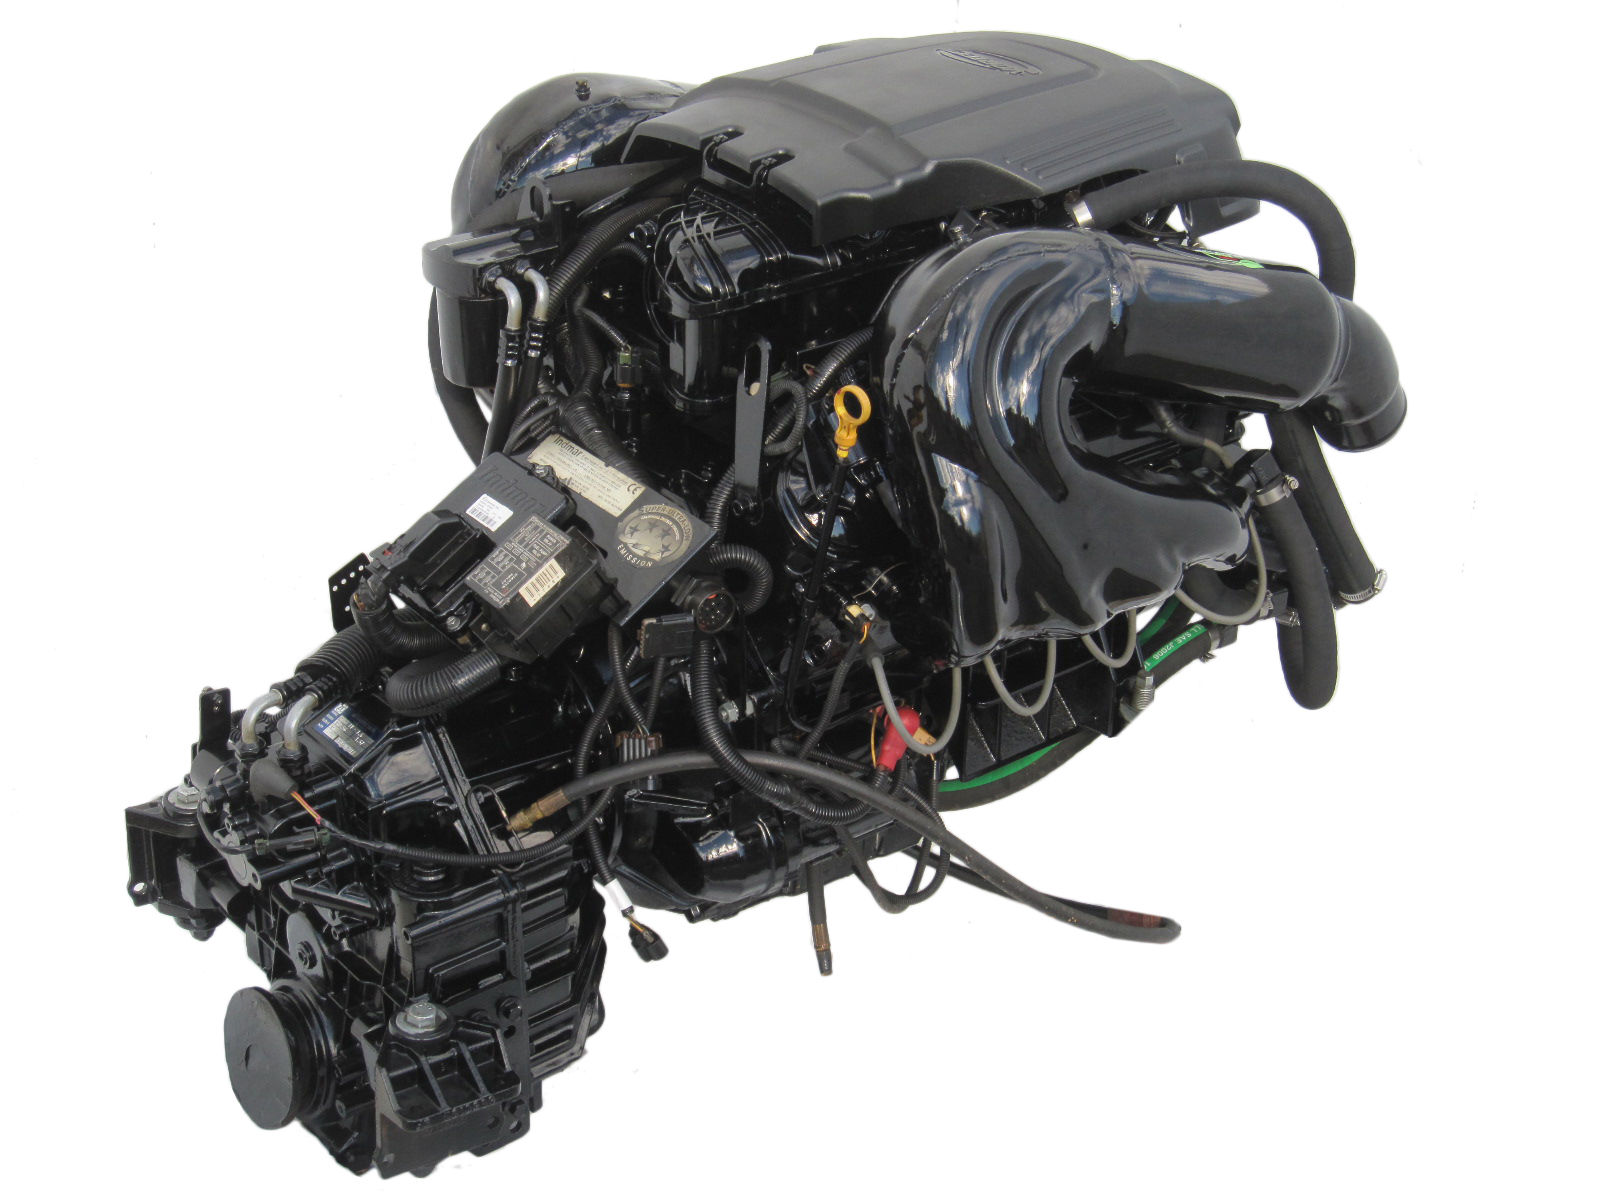 New Indmar 6 0l Vortec Inboard Marine Engine V Drive With Zf Transmission 1 6